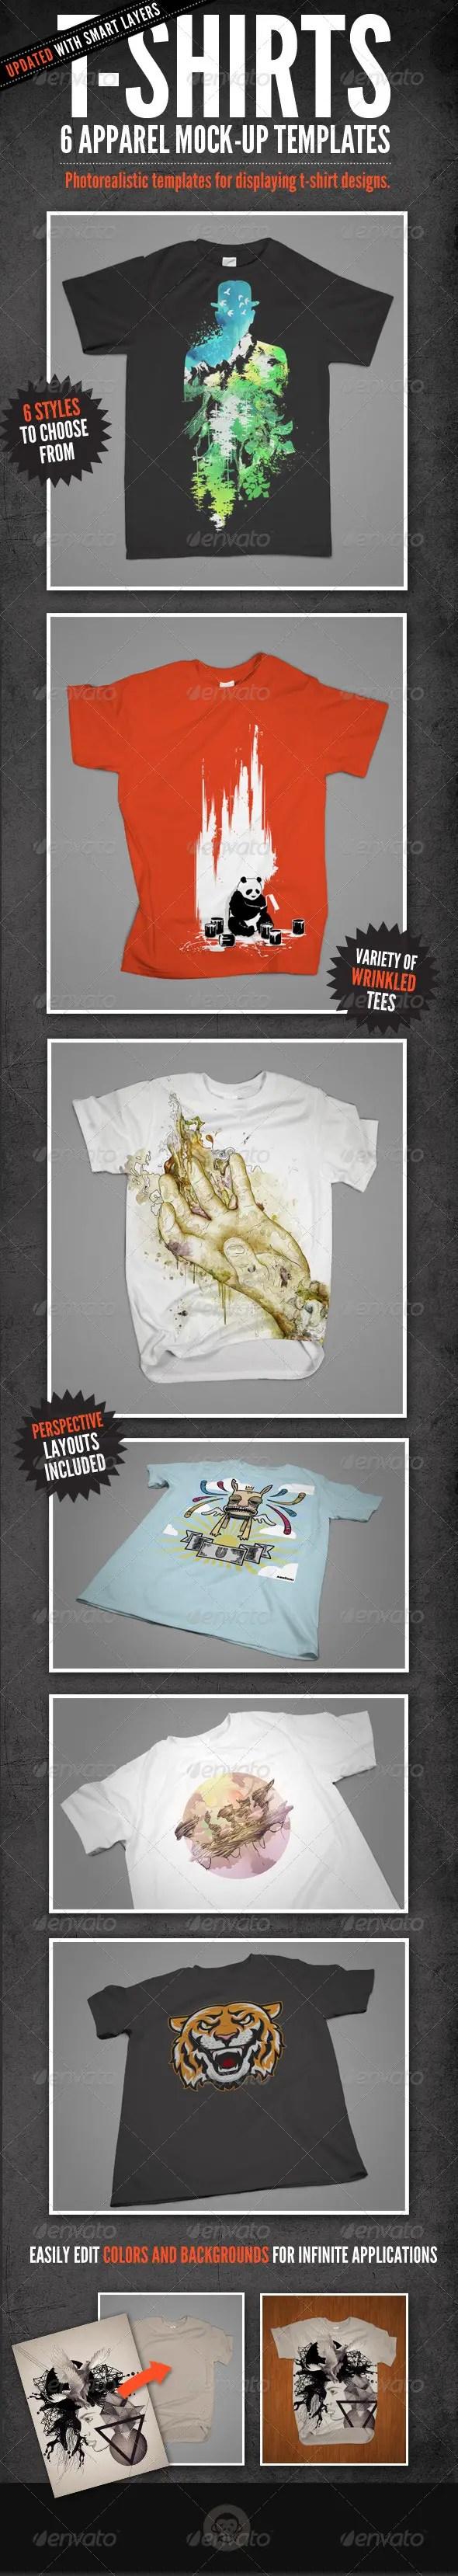 T-Shirt Mock-Ups - Apparel Design